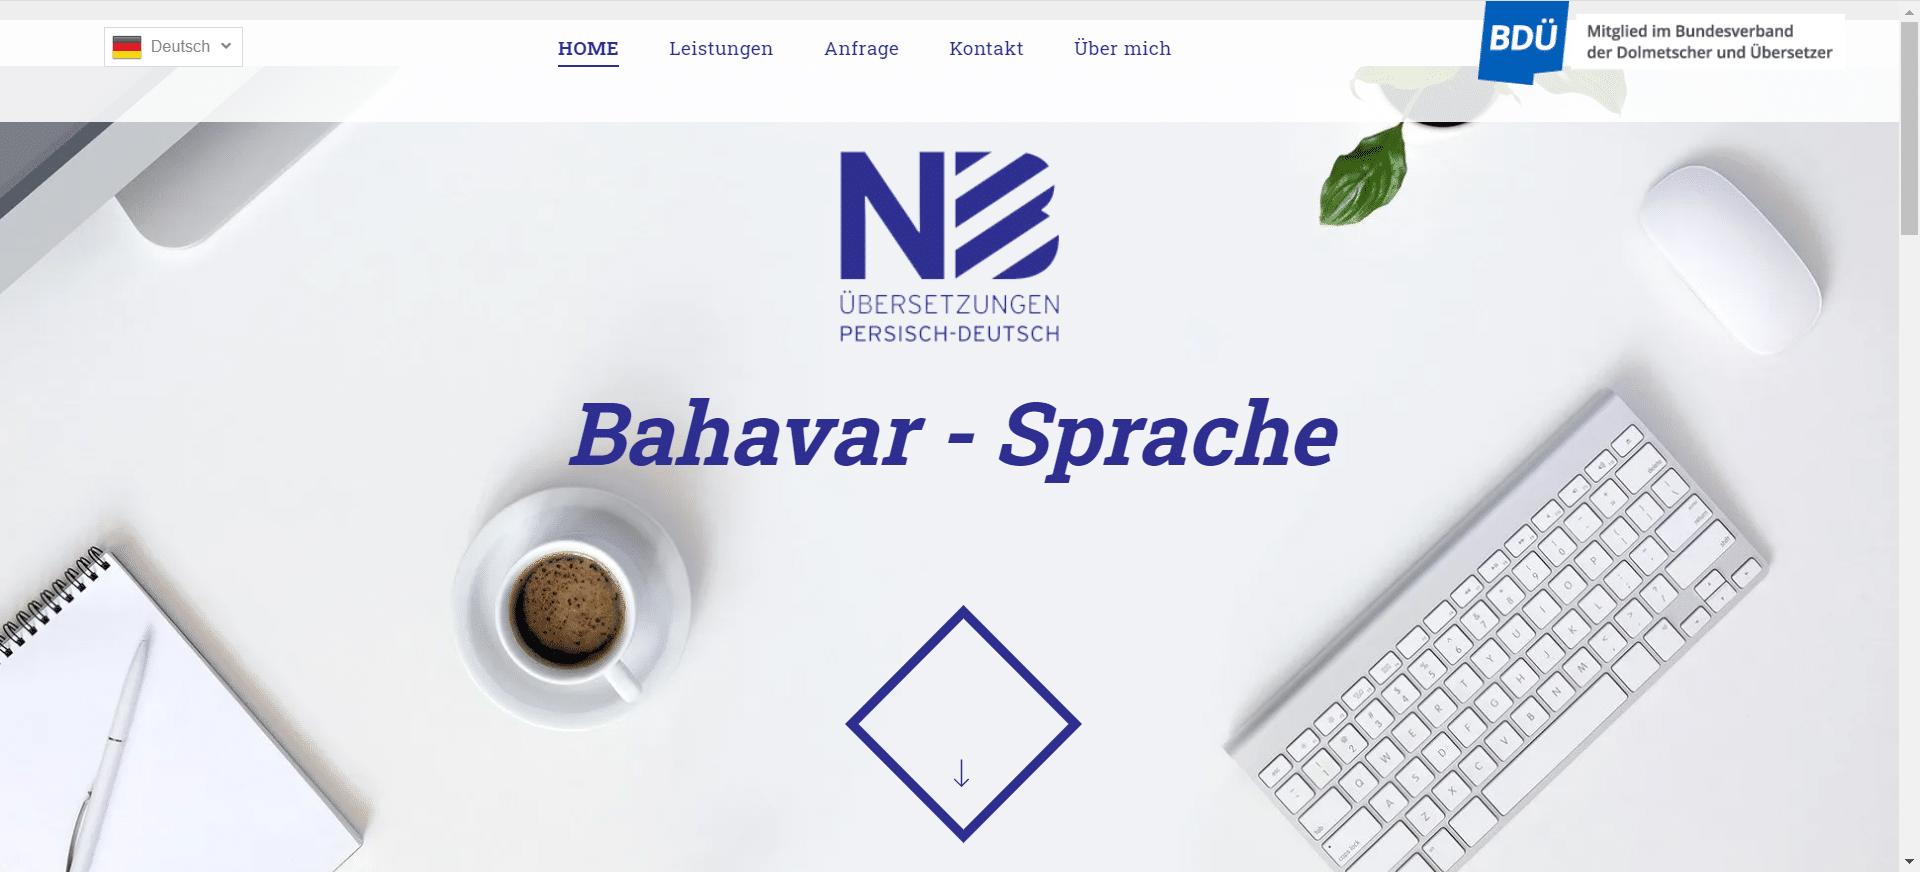 wunderbare webseite, designed by Alkenana Agentur